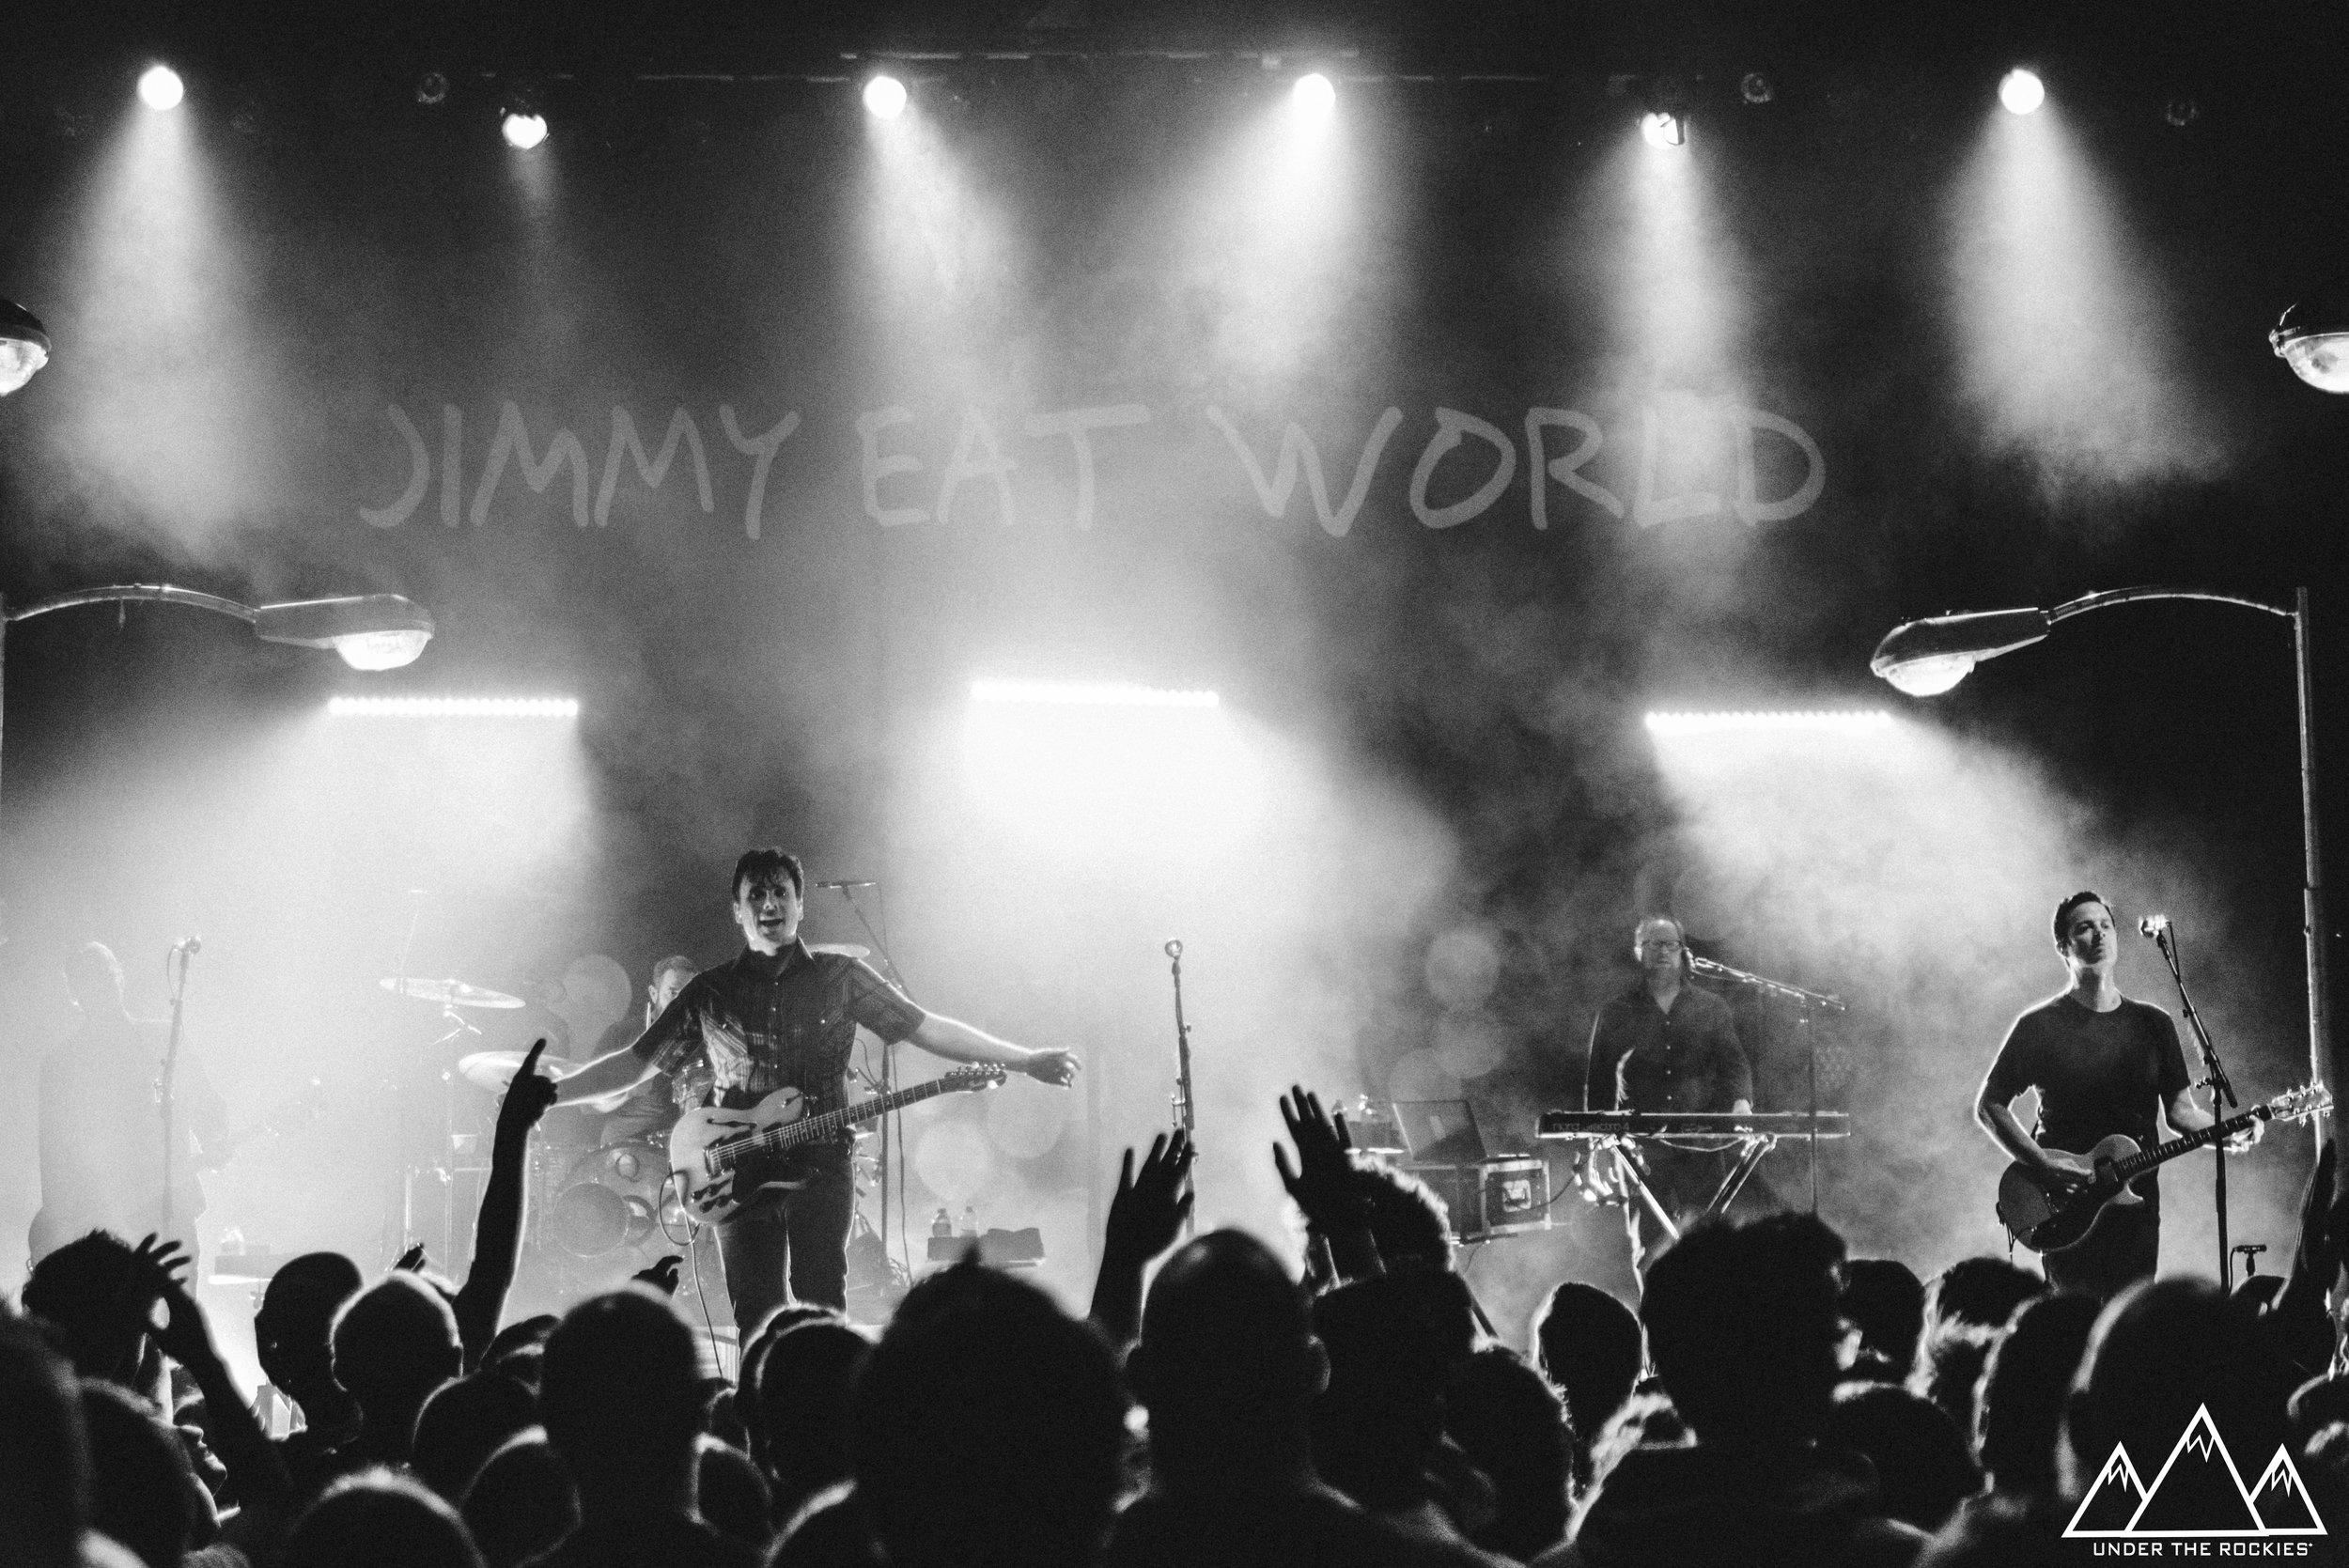 JimmyEatWorld-4.jpg